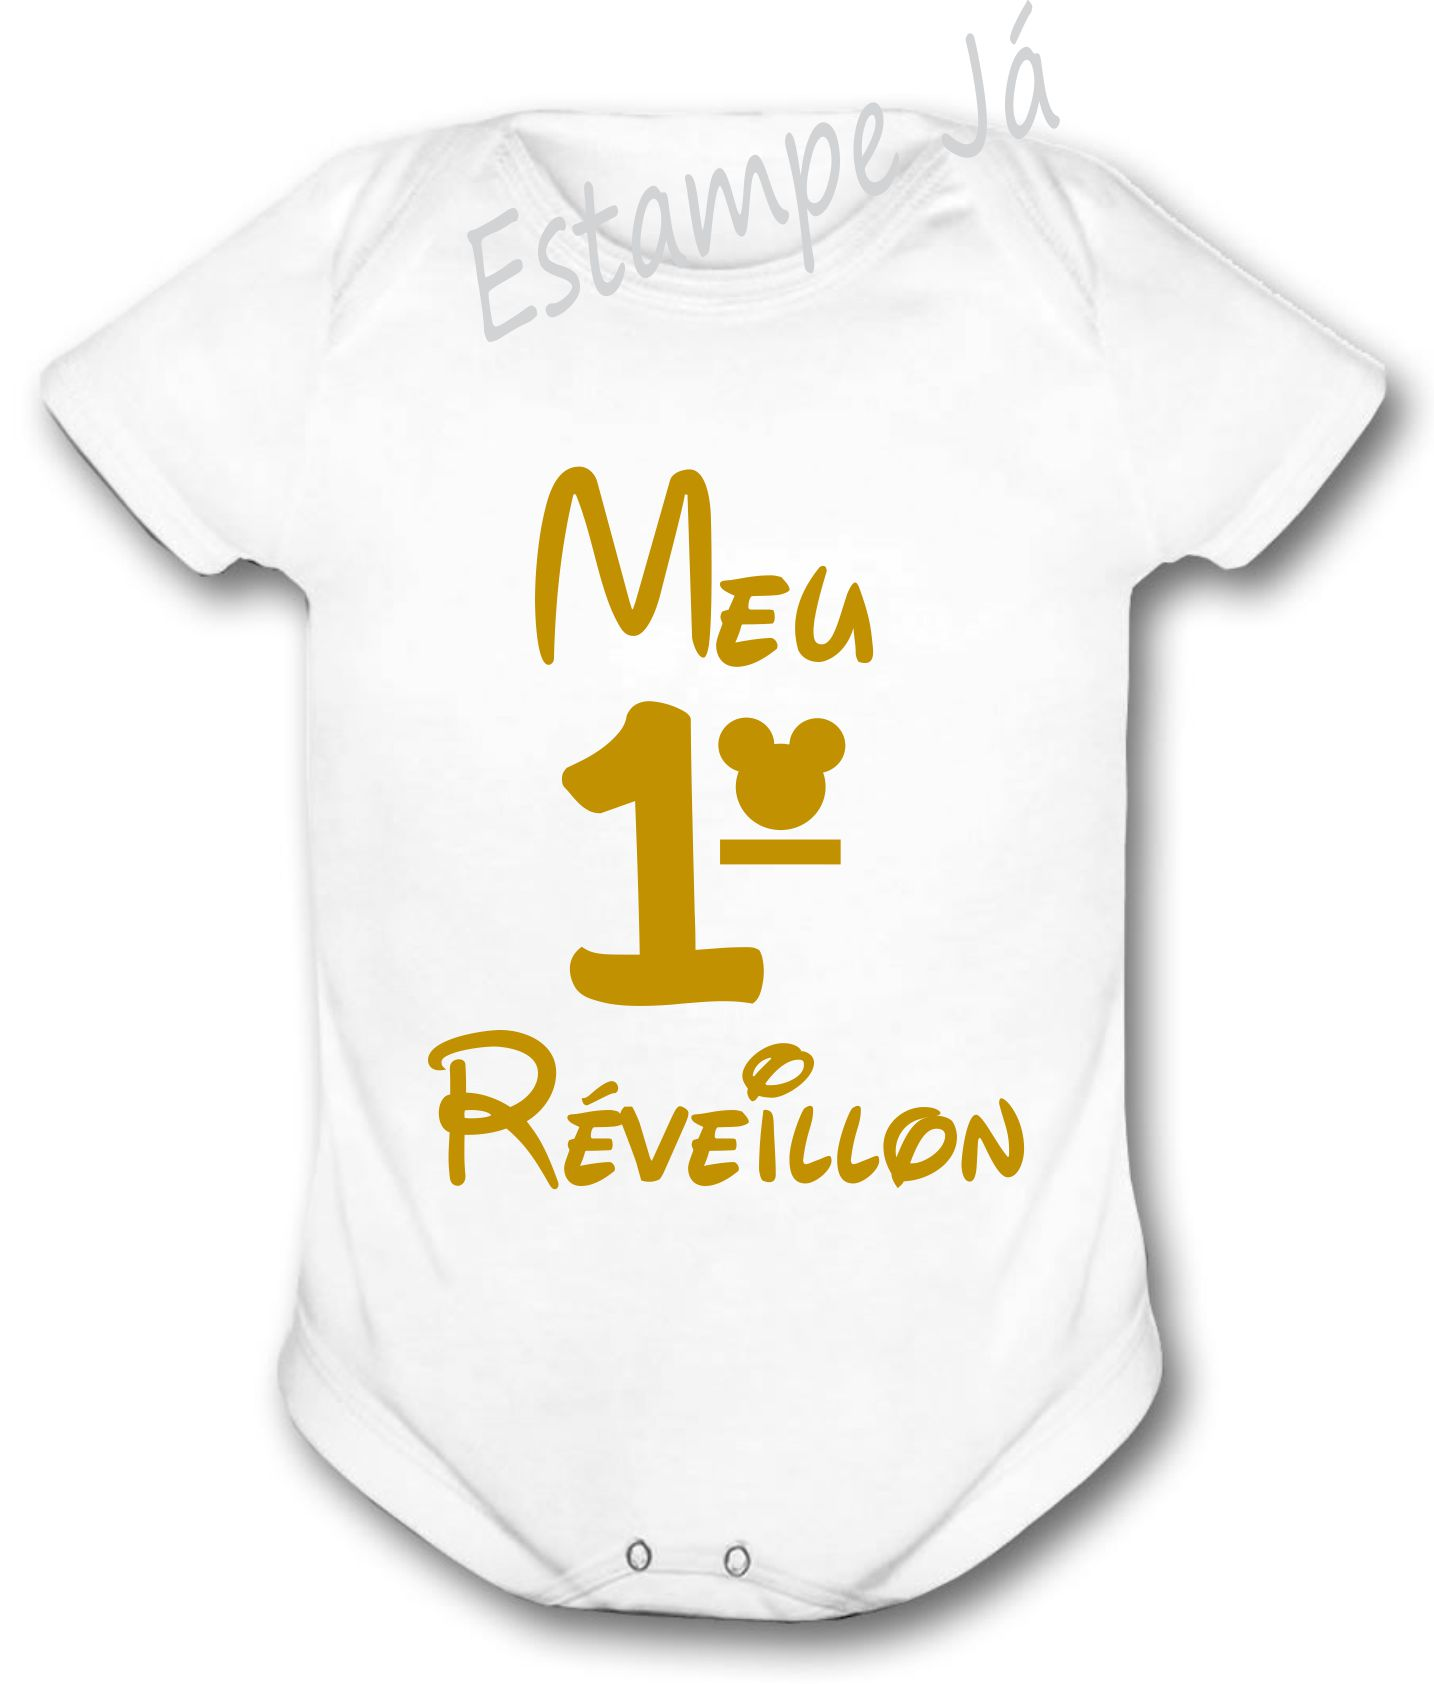 616970925444 Reveillon 2019 | Elo7